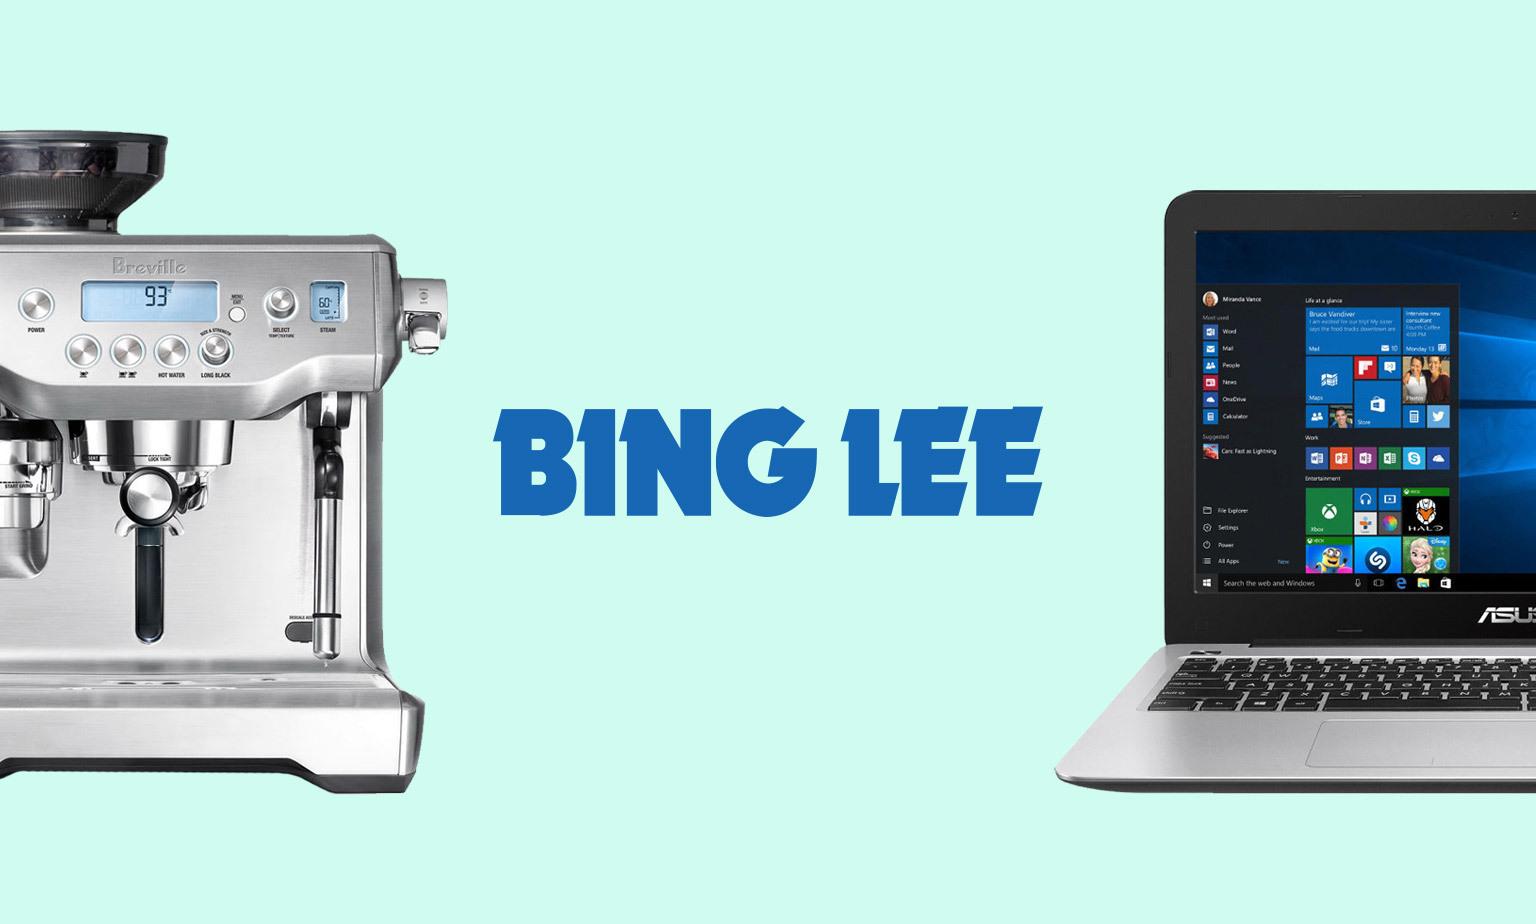 Low Prices at Bing Lee